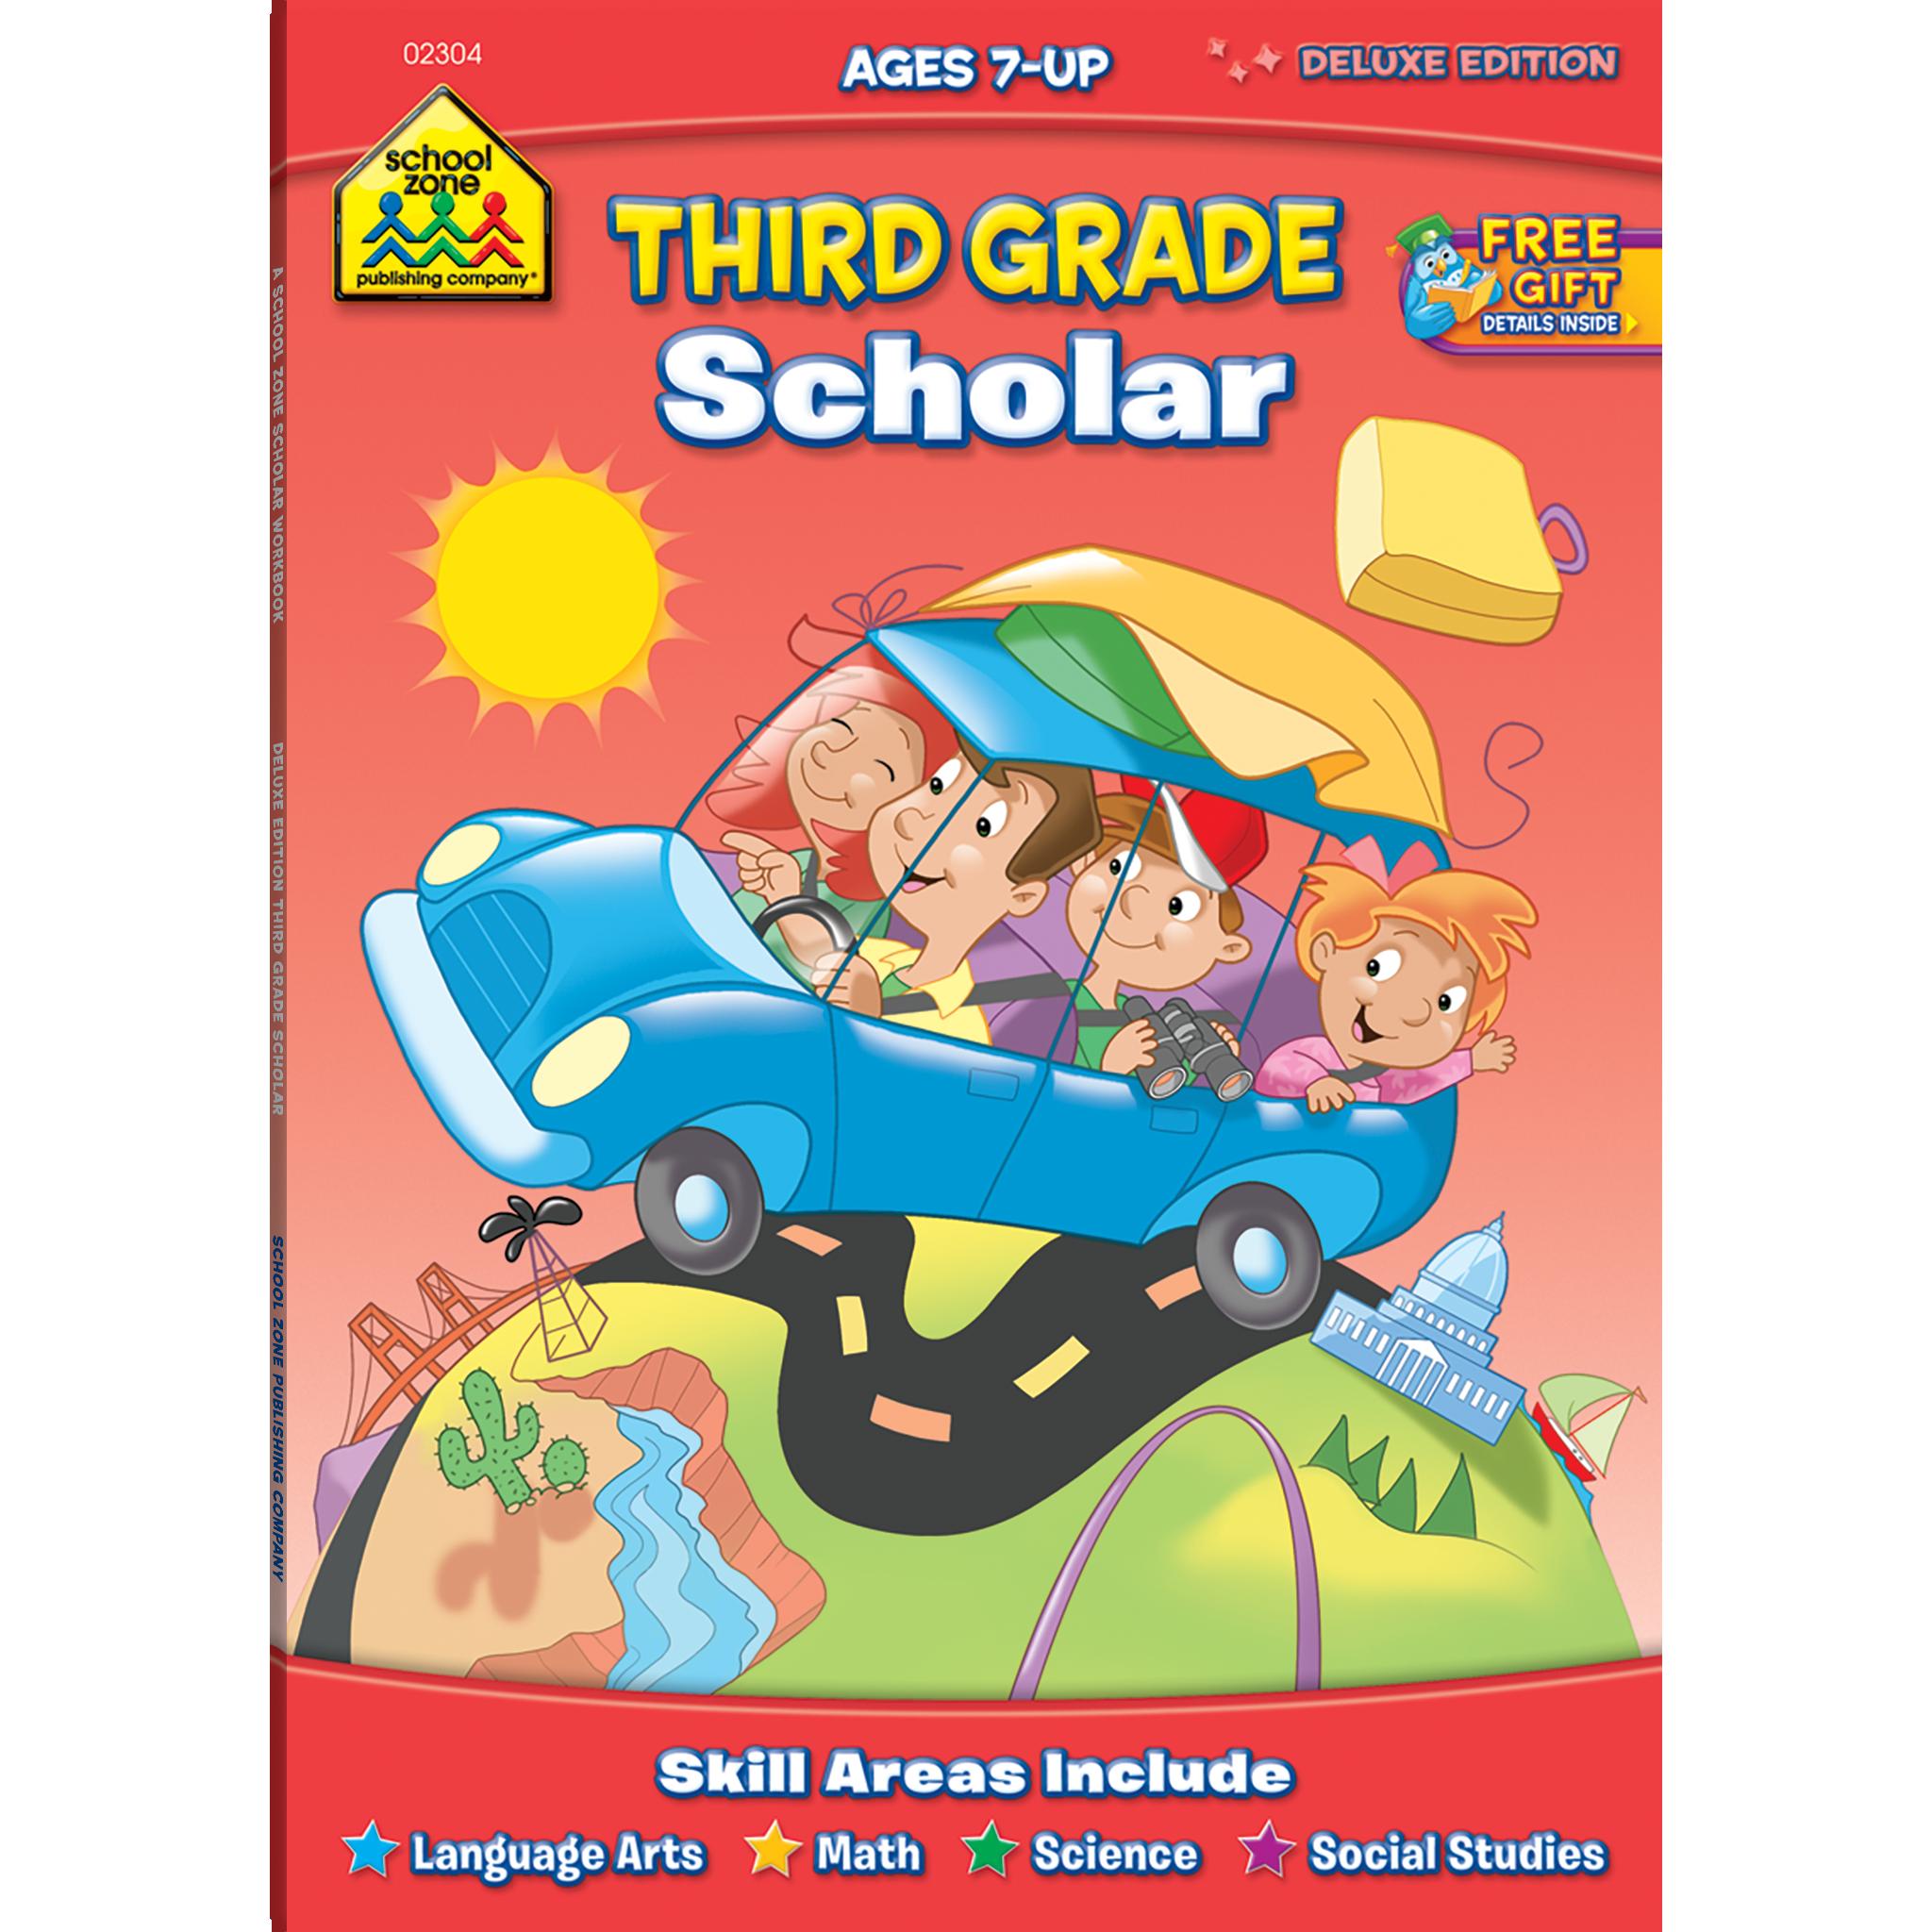 Third grade scholar deluxe. Multiplication clipart social study subject